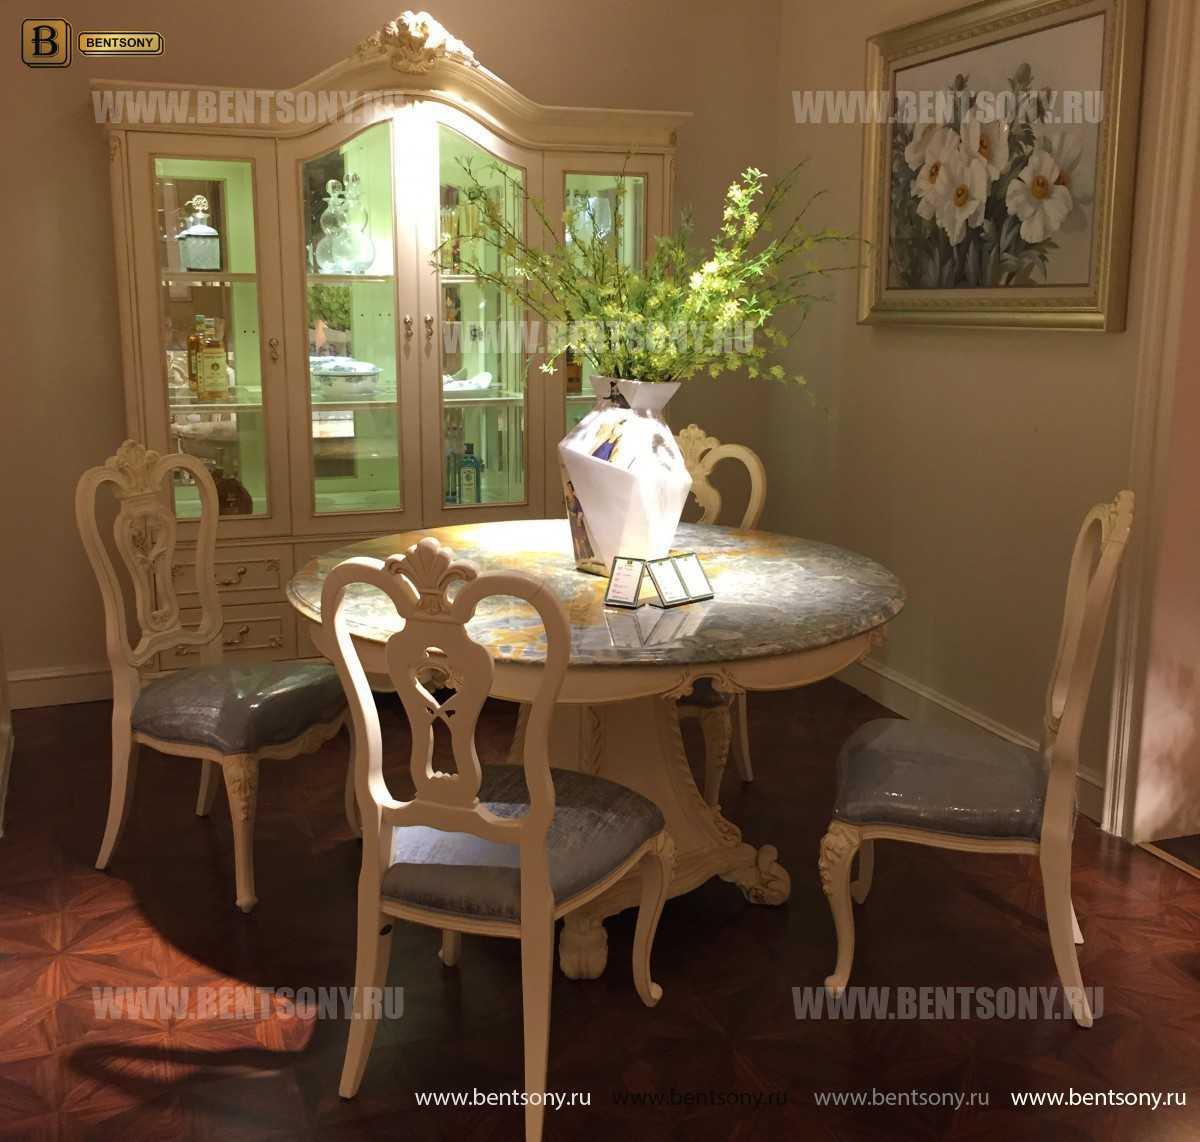 Стол обеденный круглый Митчел (Классика, мраморная столешница) каталог мебели